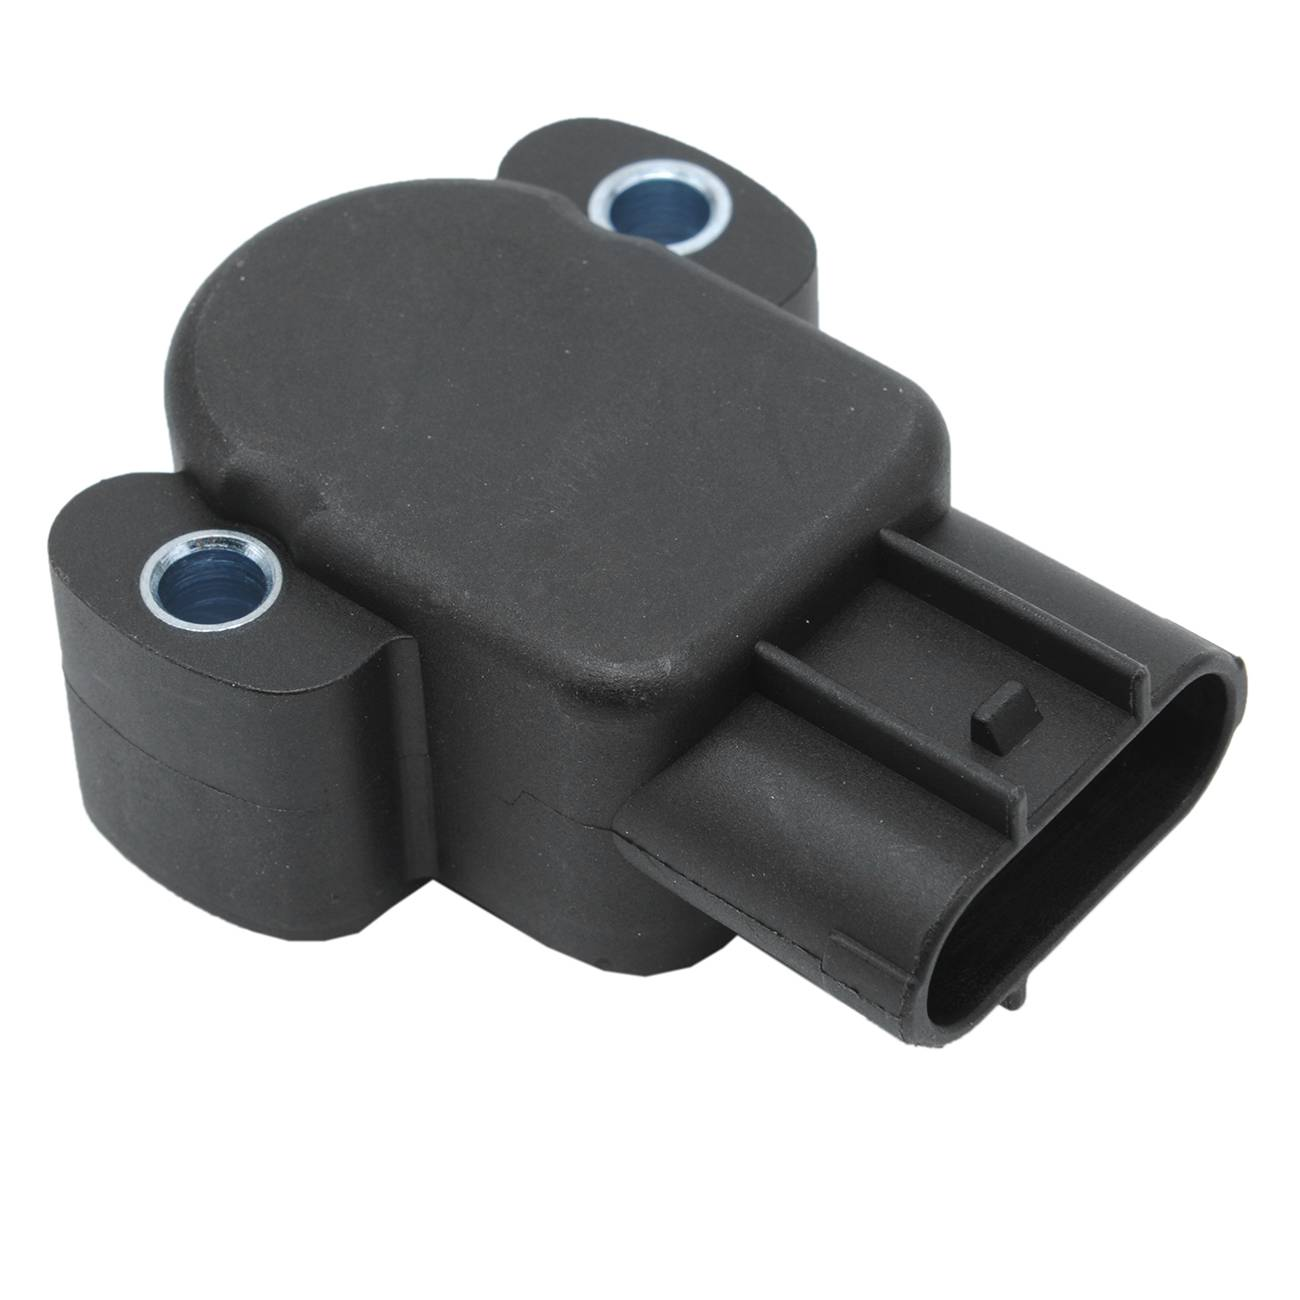 Motorcraft Throttle Position Sensor CX-1542 F57Z-9B989-A